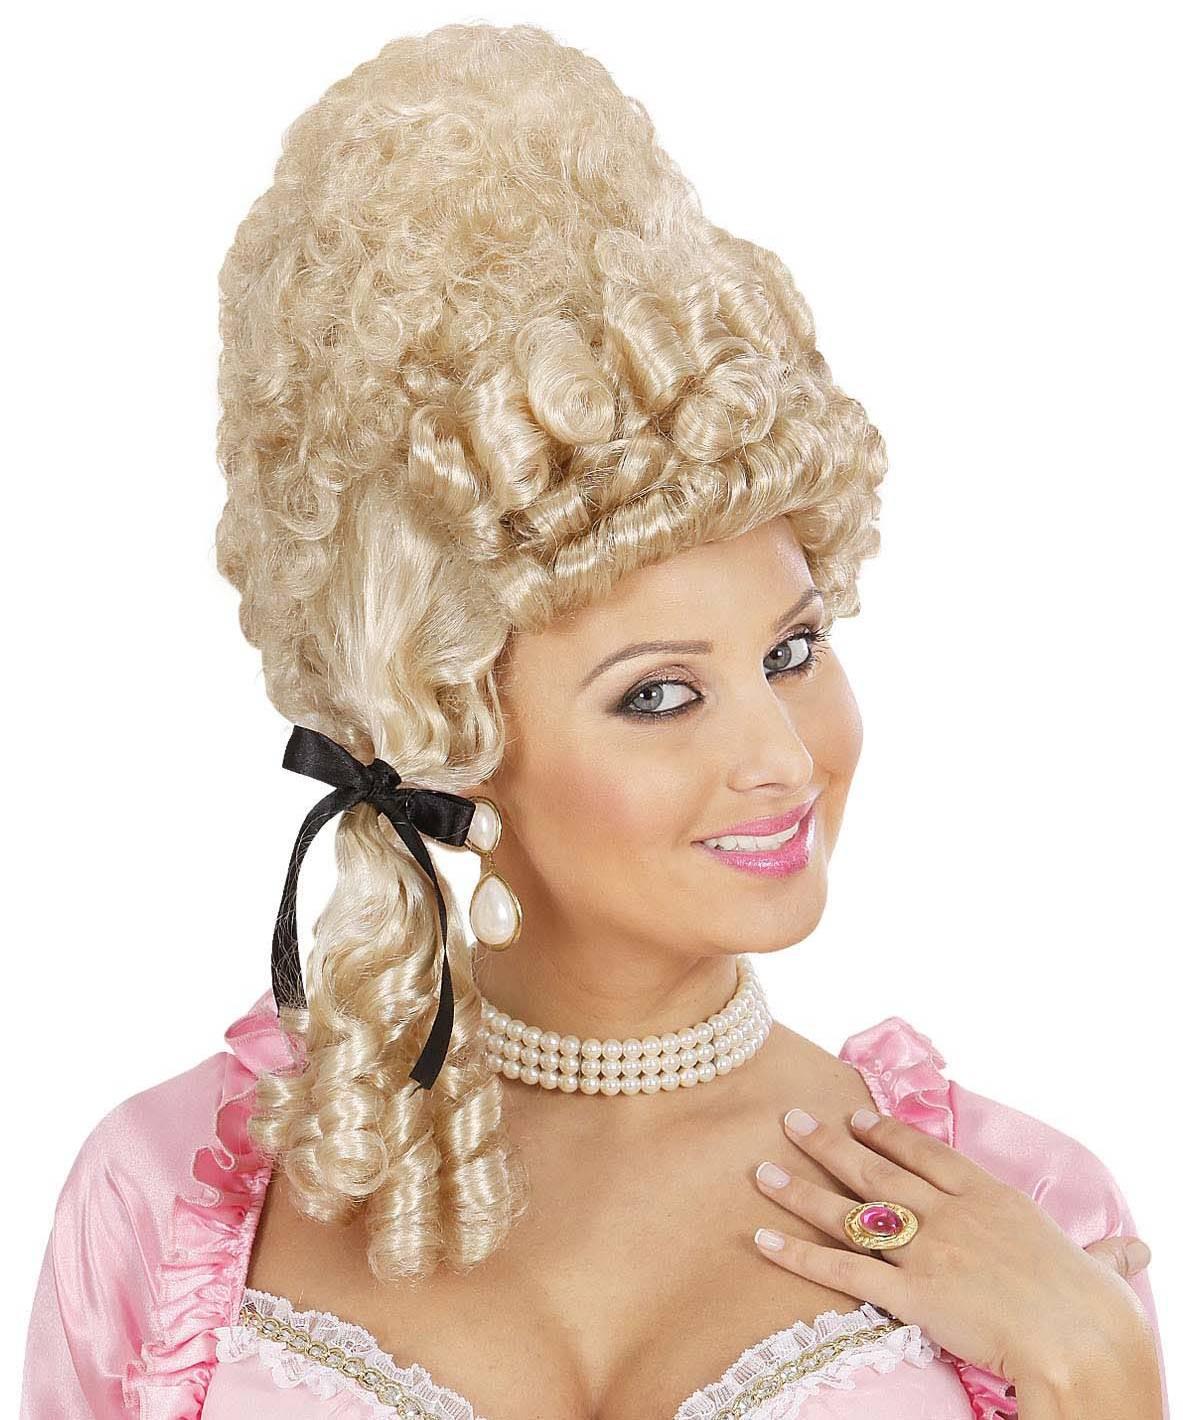 Perruque-Marie-Antoinette-blonde-2